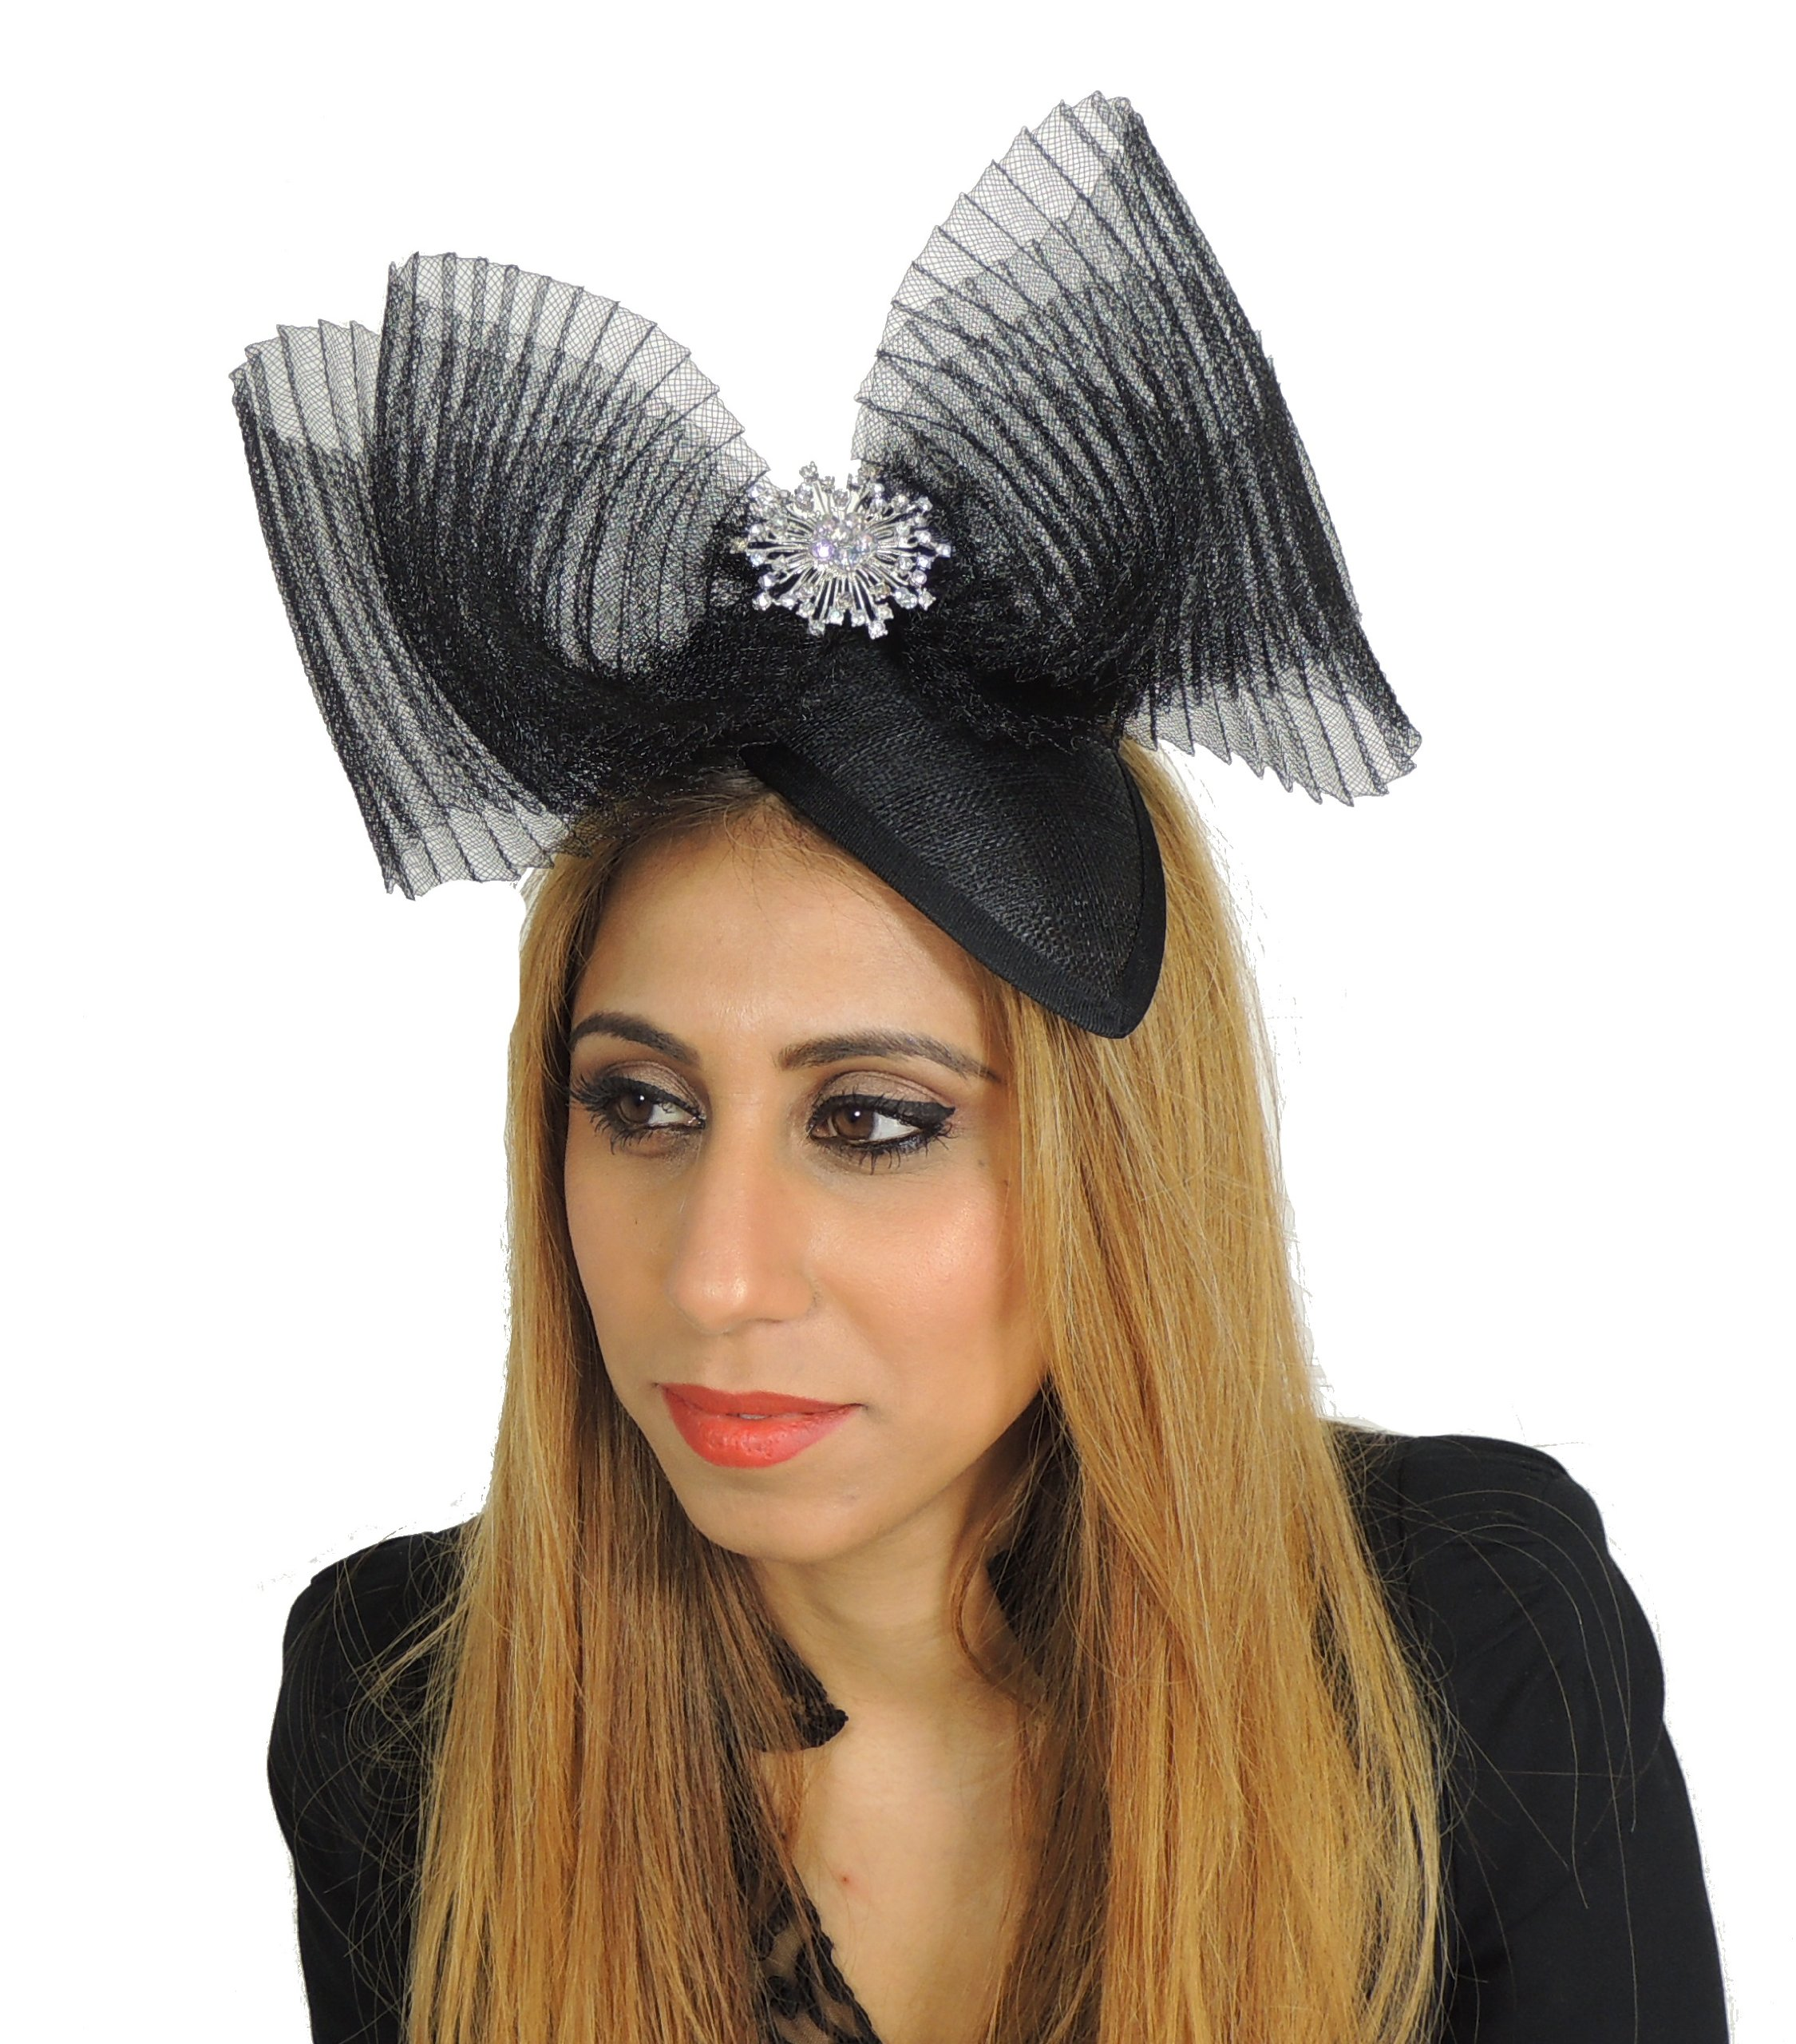 Hats By Cressida Ladies Wedding Races Ascot Derby Fascinator Headband Black